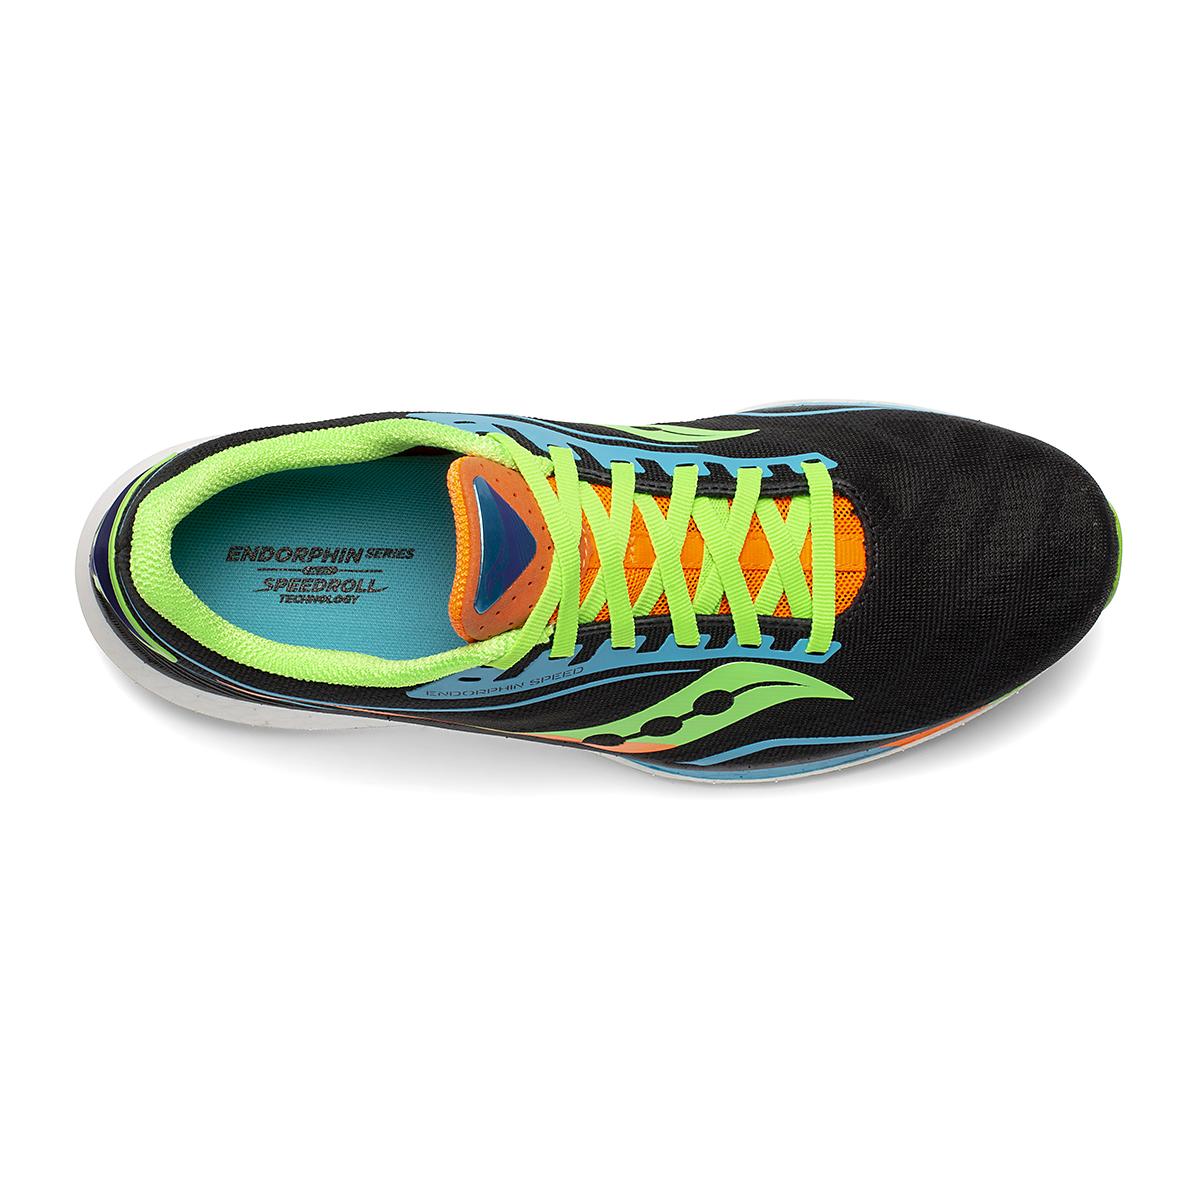 Men's Saucony Endorphin Speed Running Shoe - Color: Future/Black - Size: 7.5 - Width: Regular, Future/Black, large, image 3